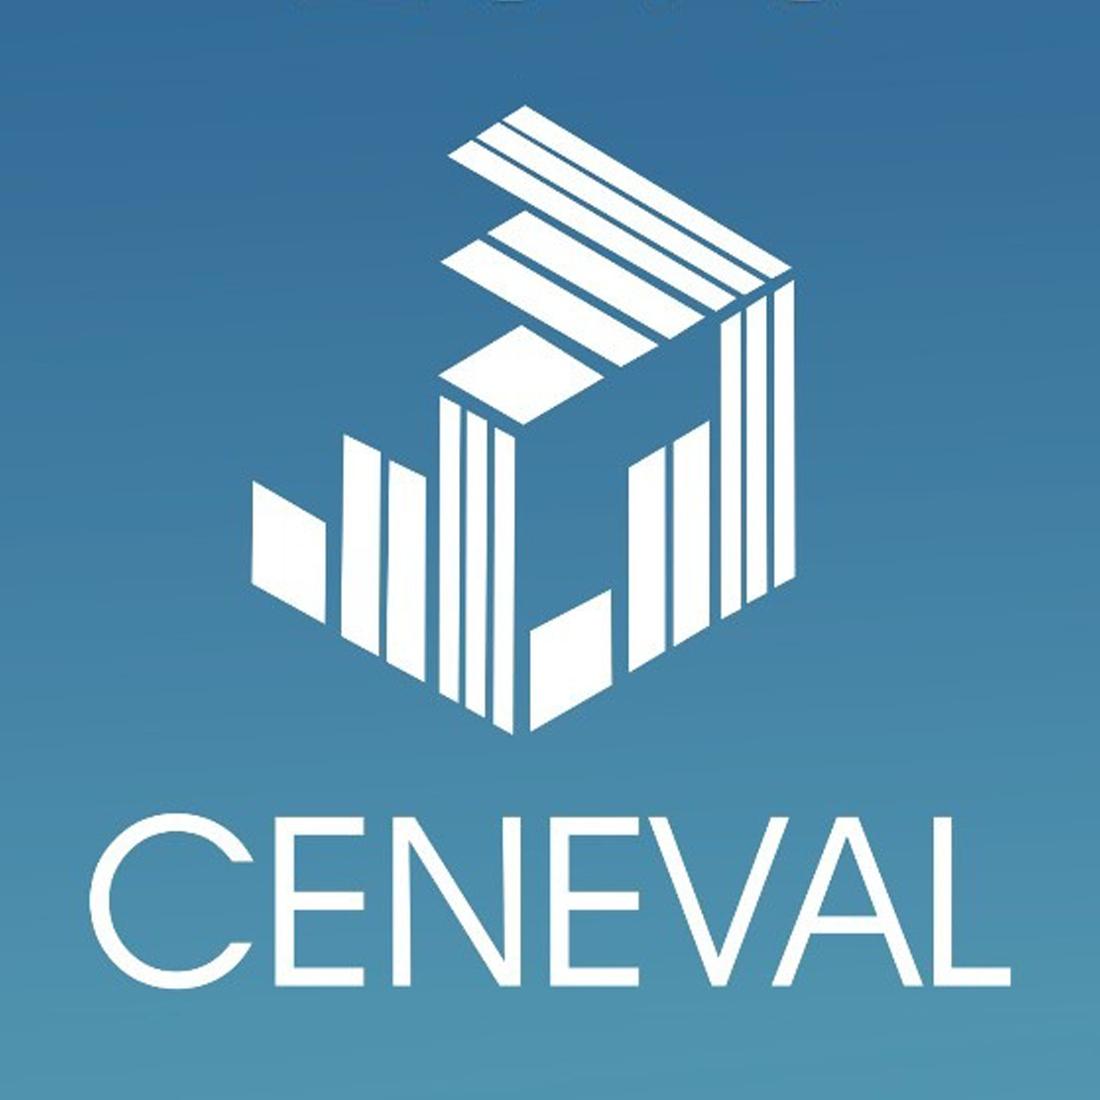 CENEVAL Logo photo - 1